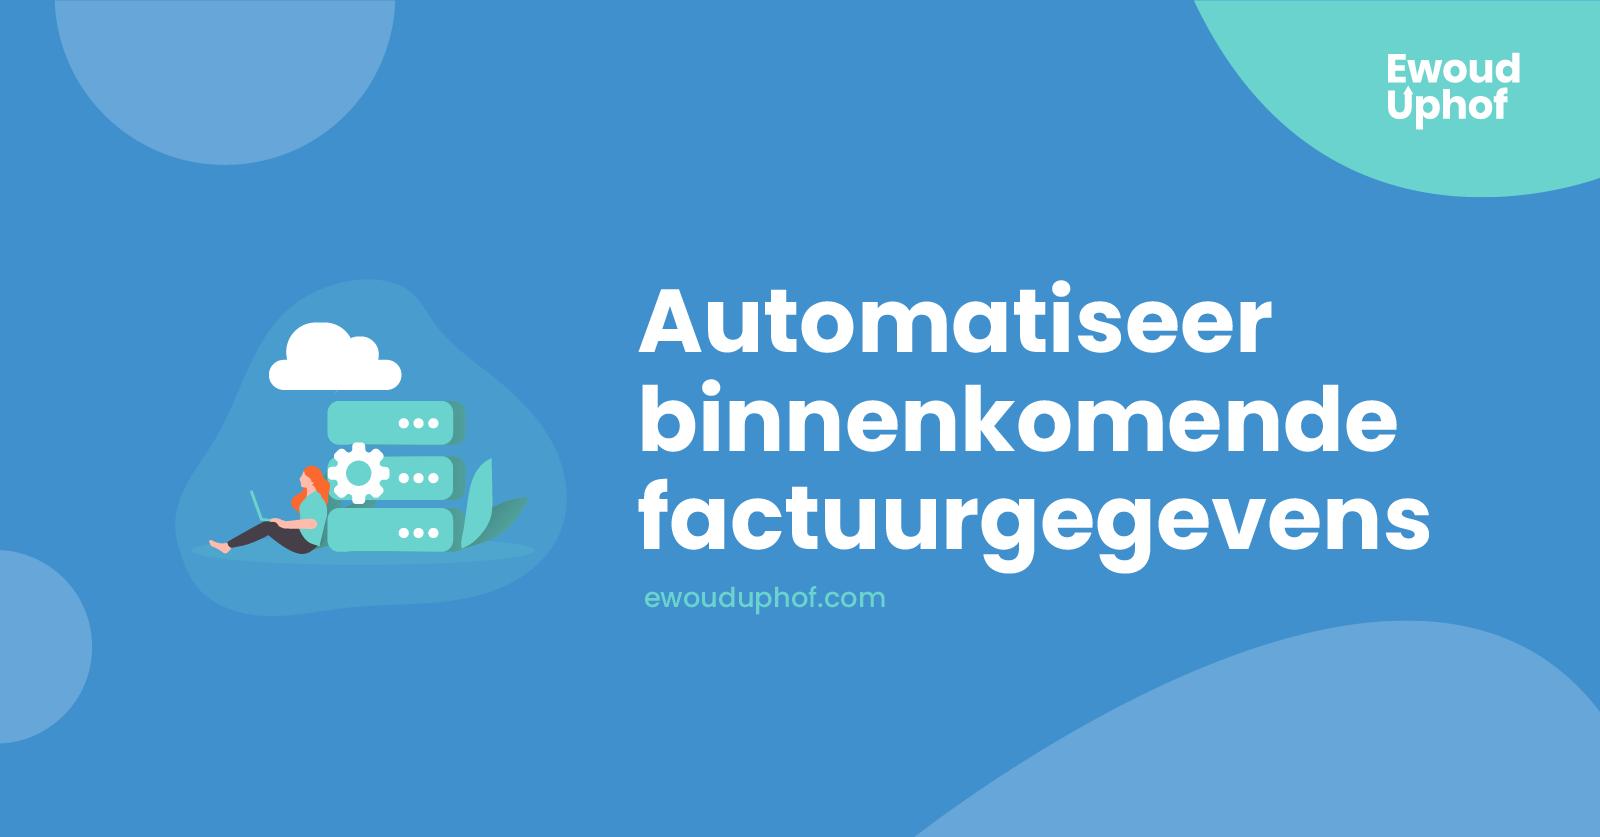 Automatiseer factuurgegevens